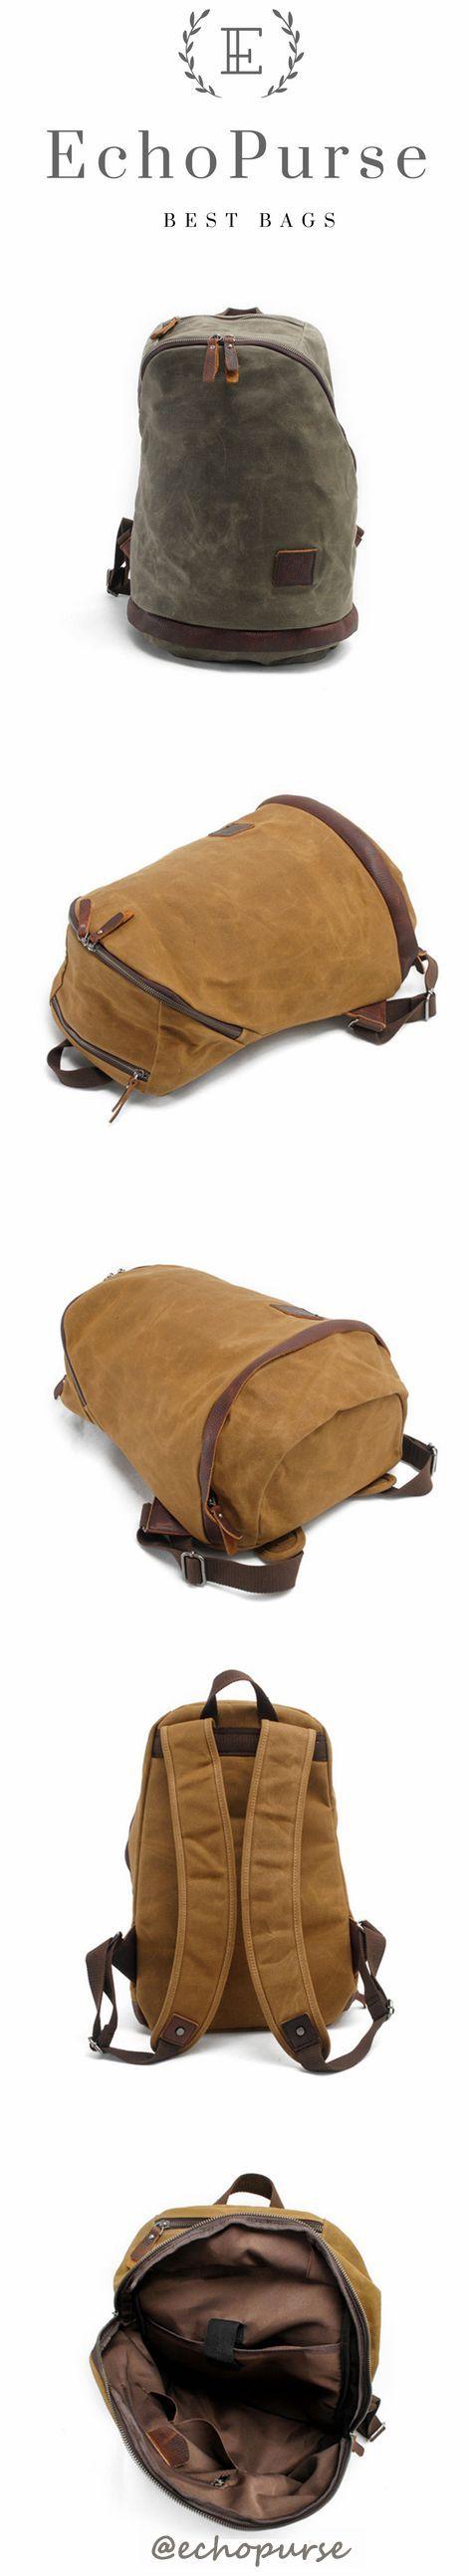 Waxed Canvas Leather Laptop Backpack, Waterproof Rucksack, Rucksack MC038